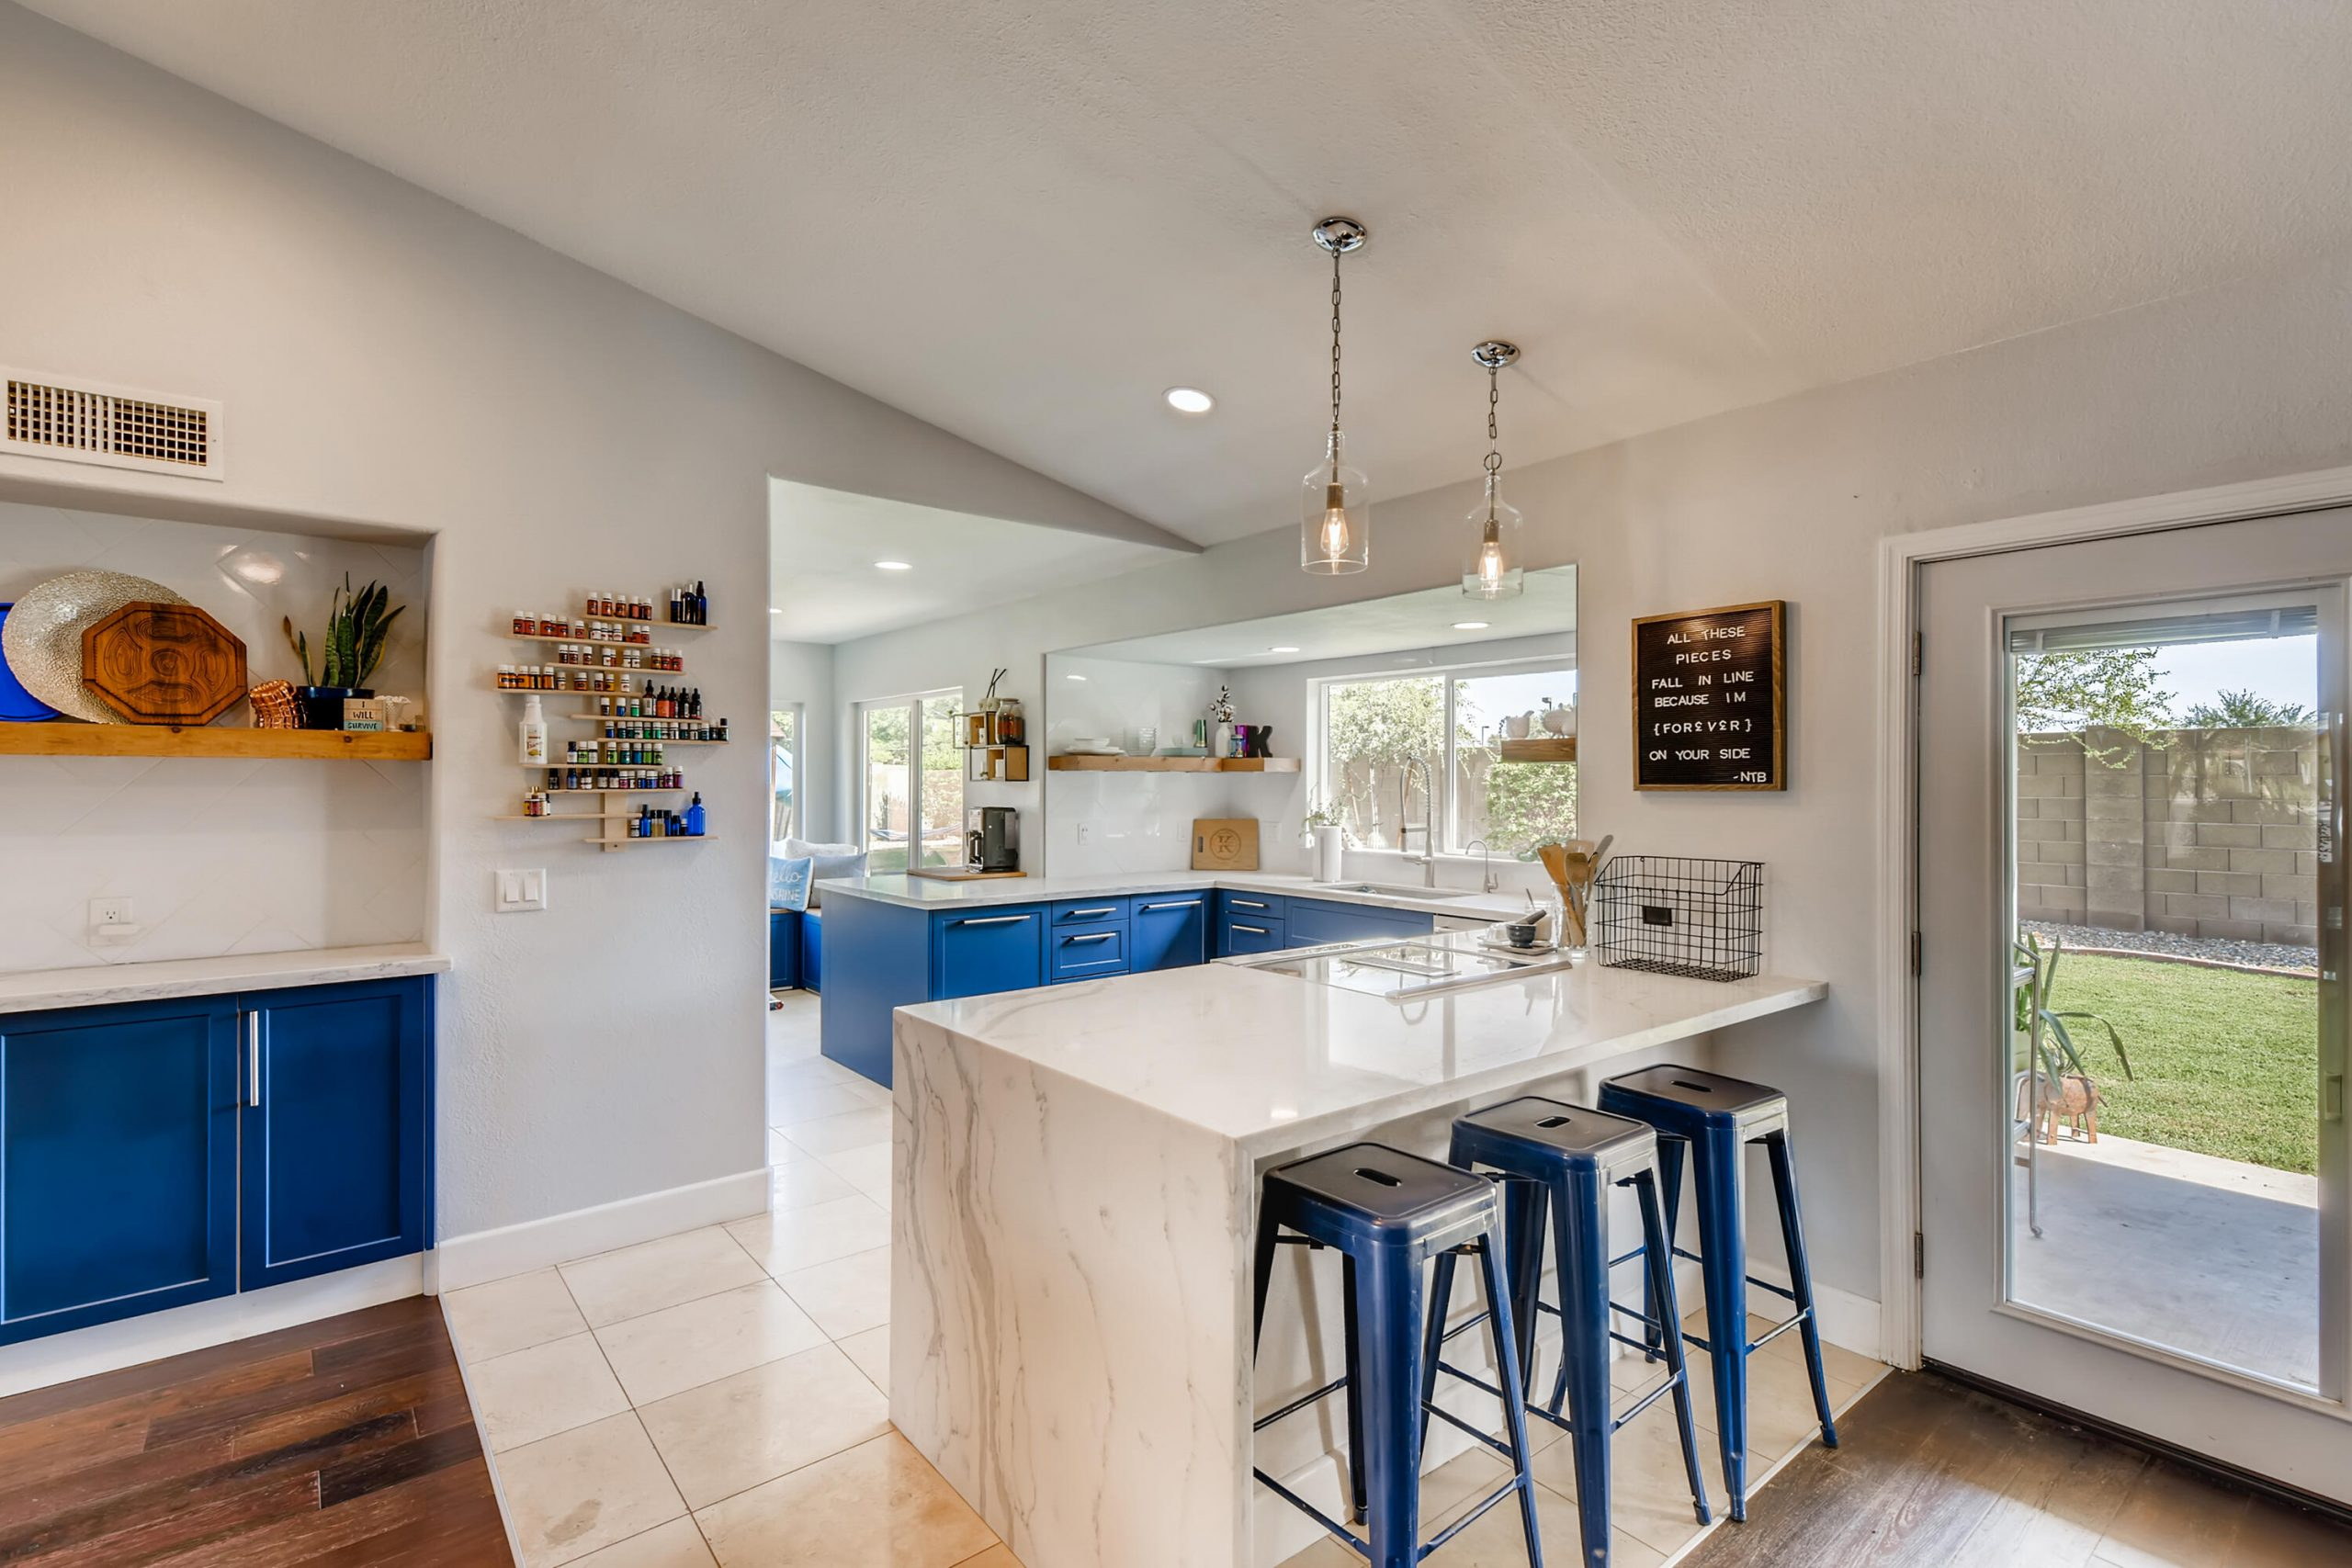 Kitchen-Island-scaled.jpg